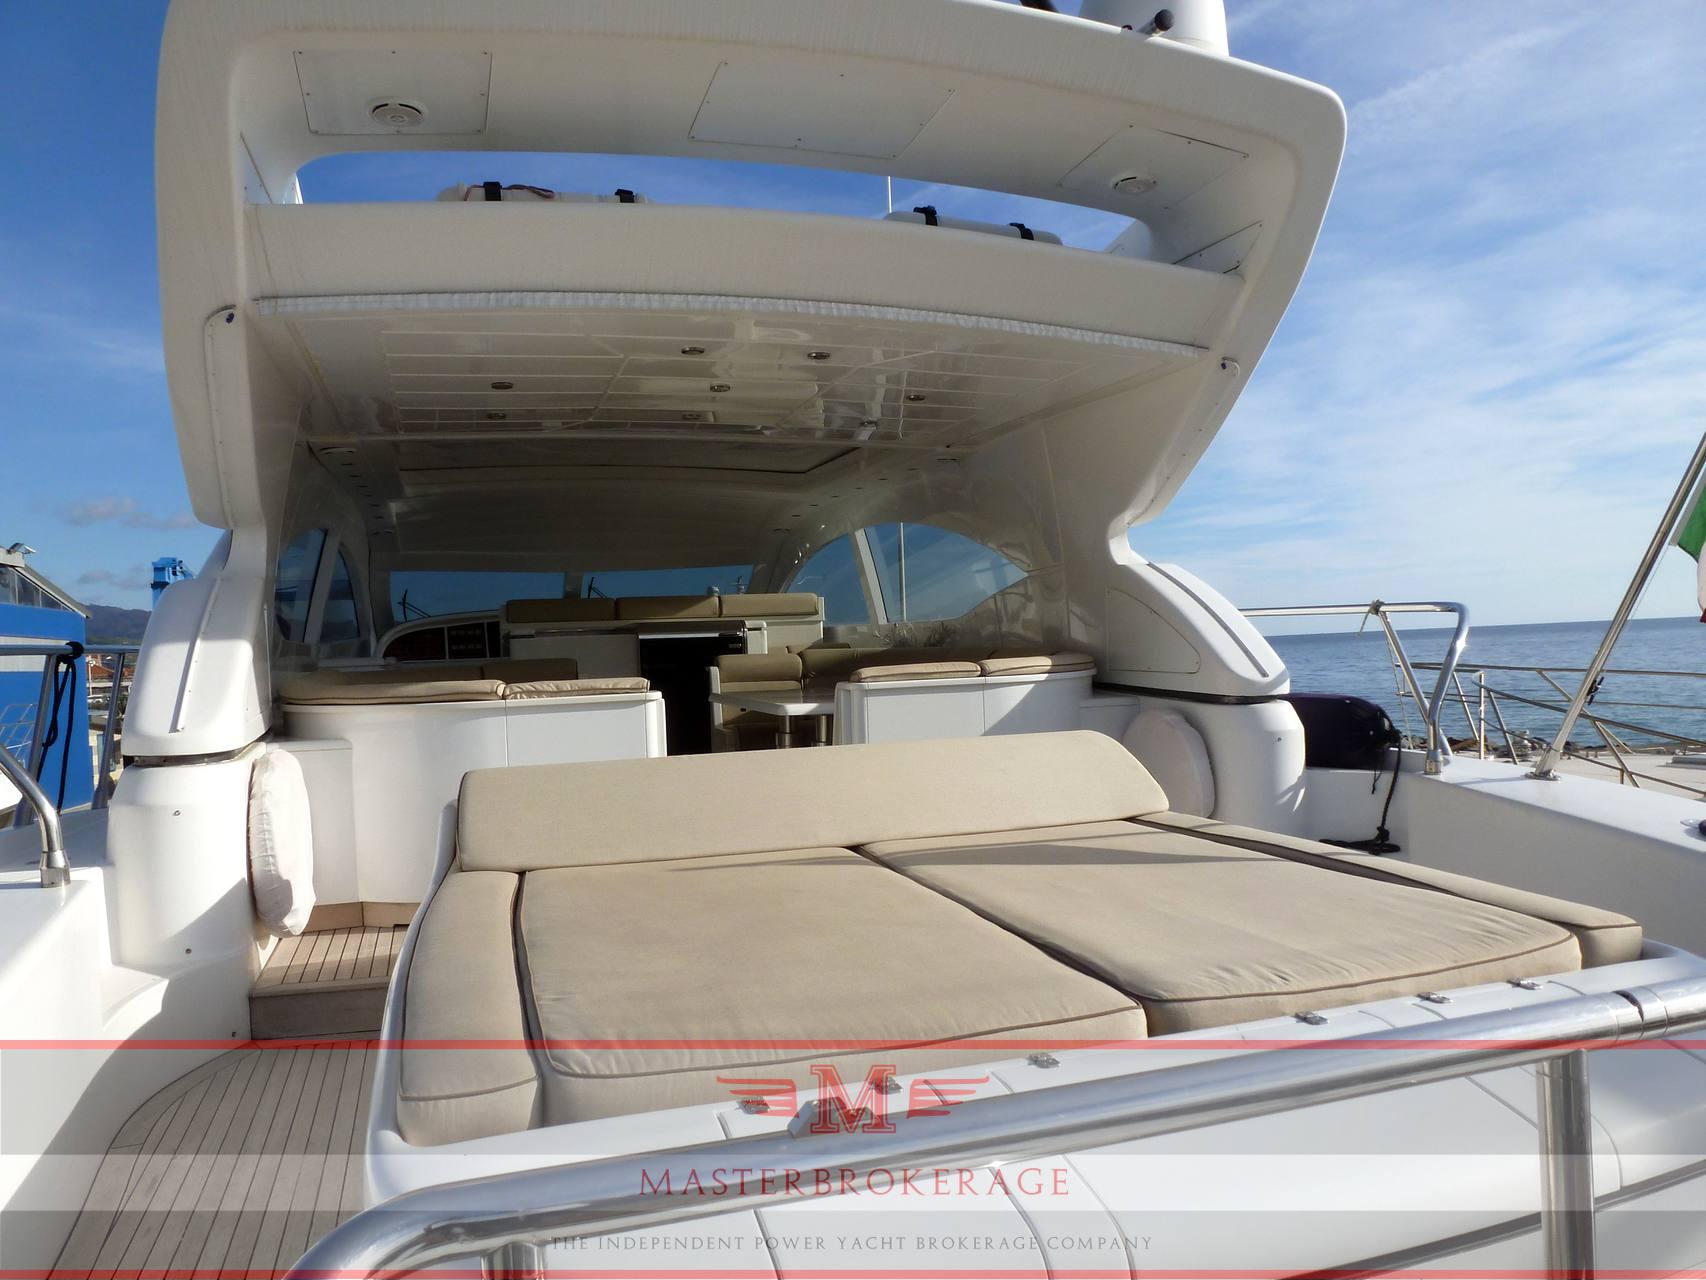 OVERMARINE Mangusta 72 Barco de motor usado para venta